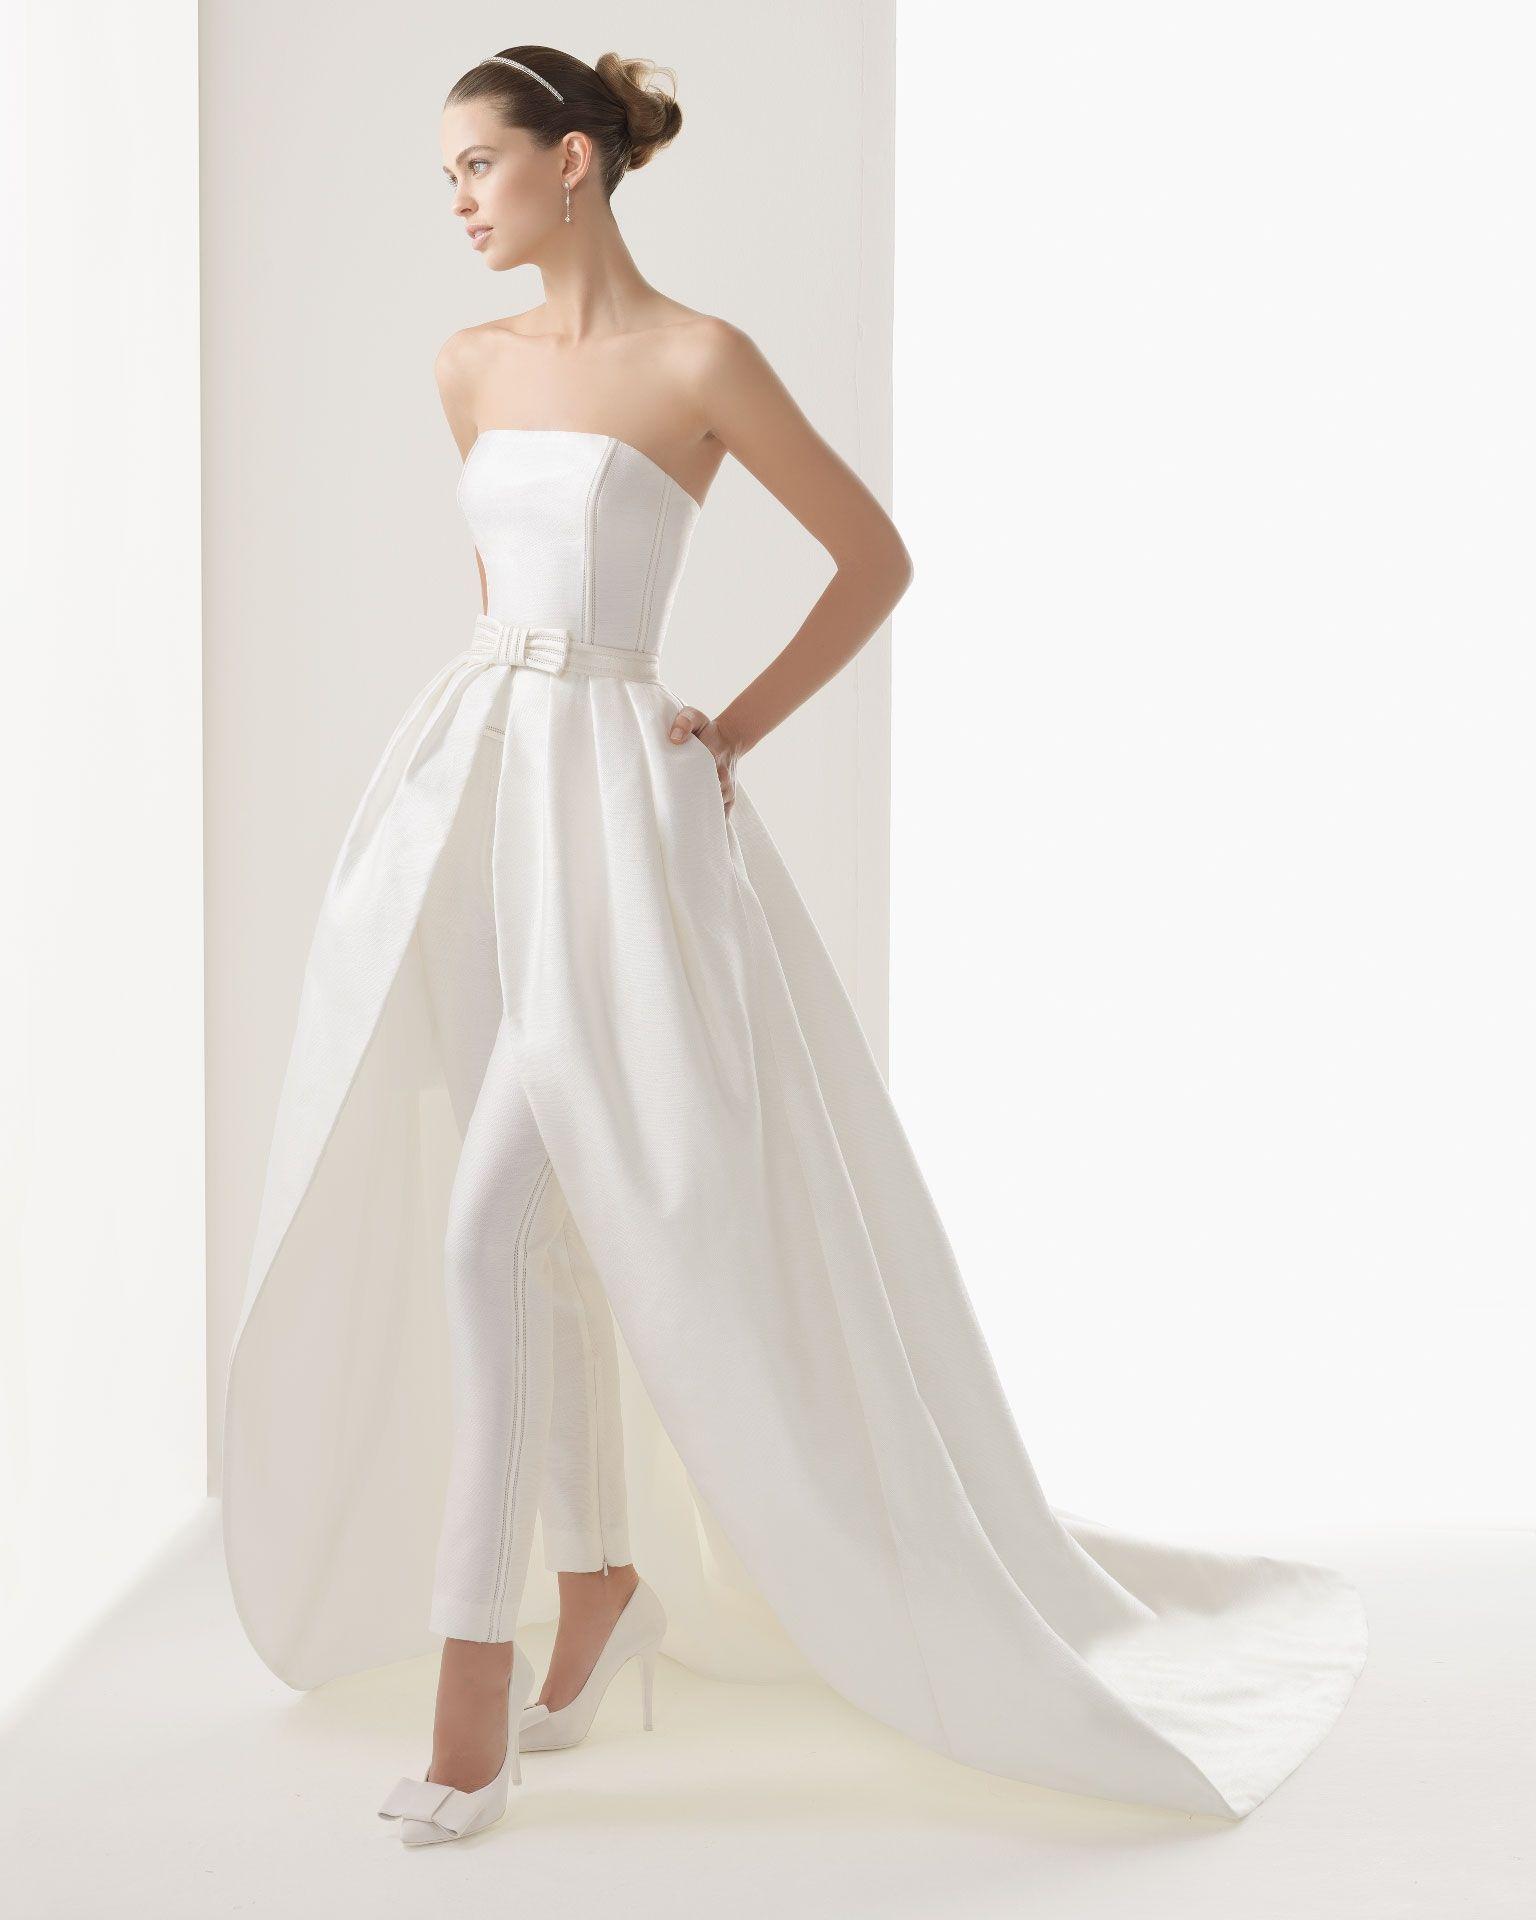 Strapless and backless wedding dress  cloefvo  Novias con pantalones  Pinterest  Maxi shirts